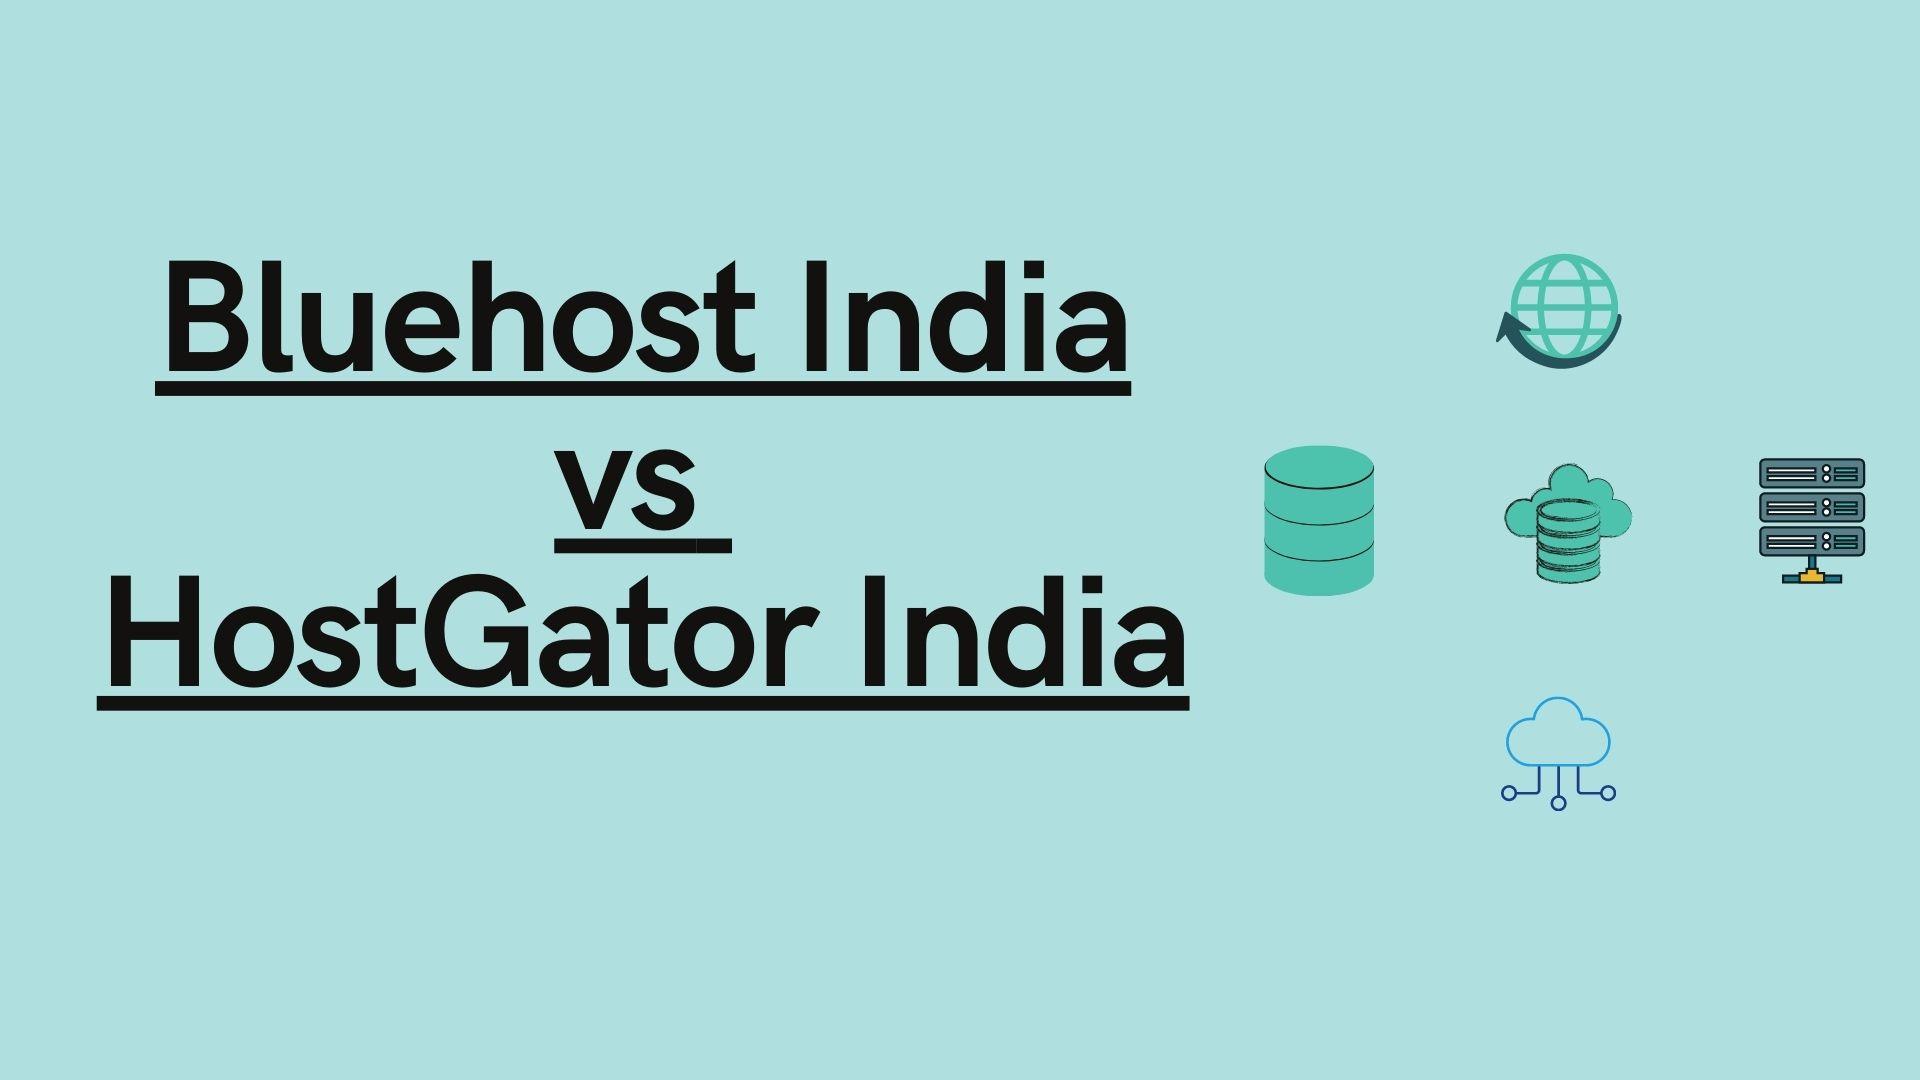 Bluehost India vs HostGator India